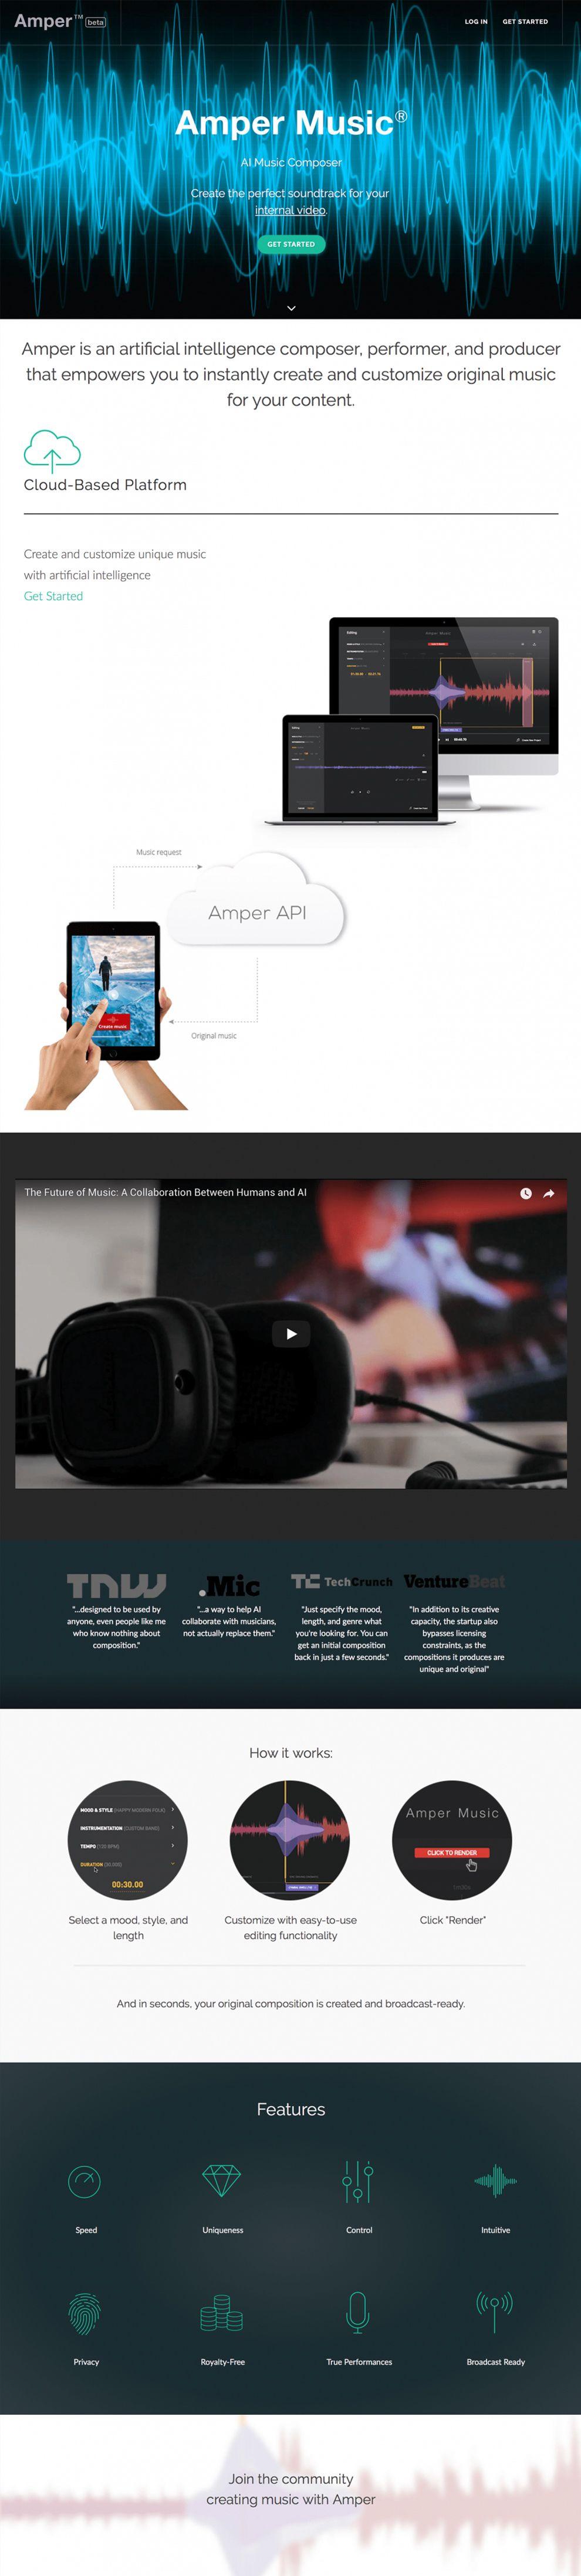 Amper Music Great Homepage